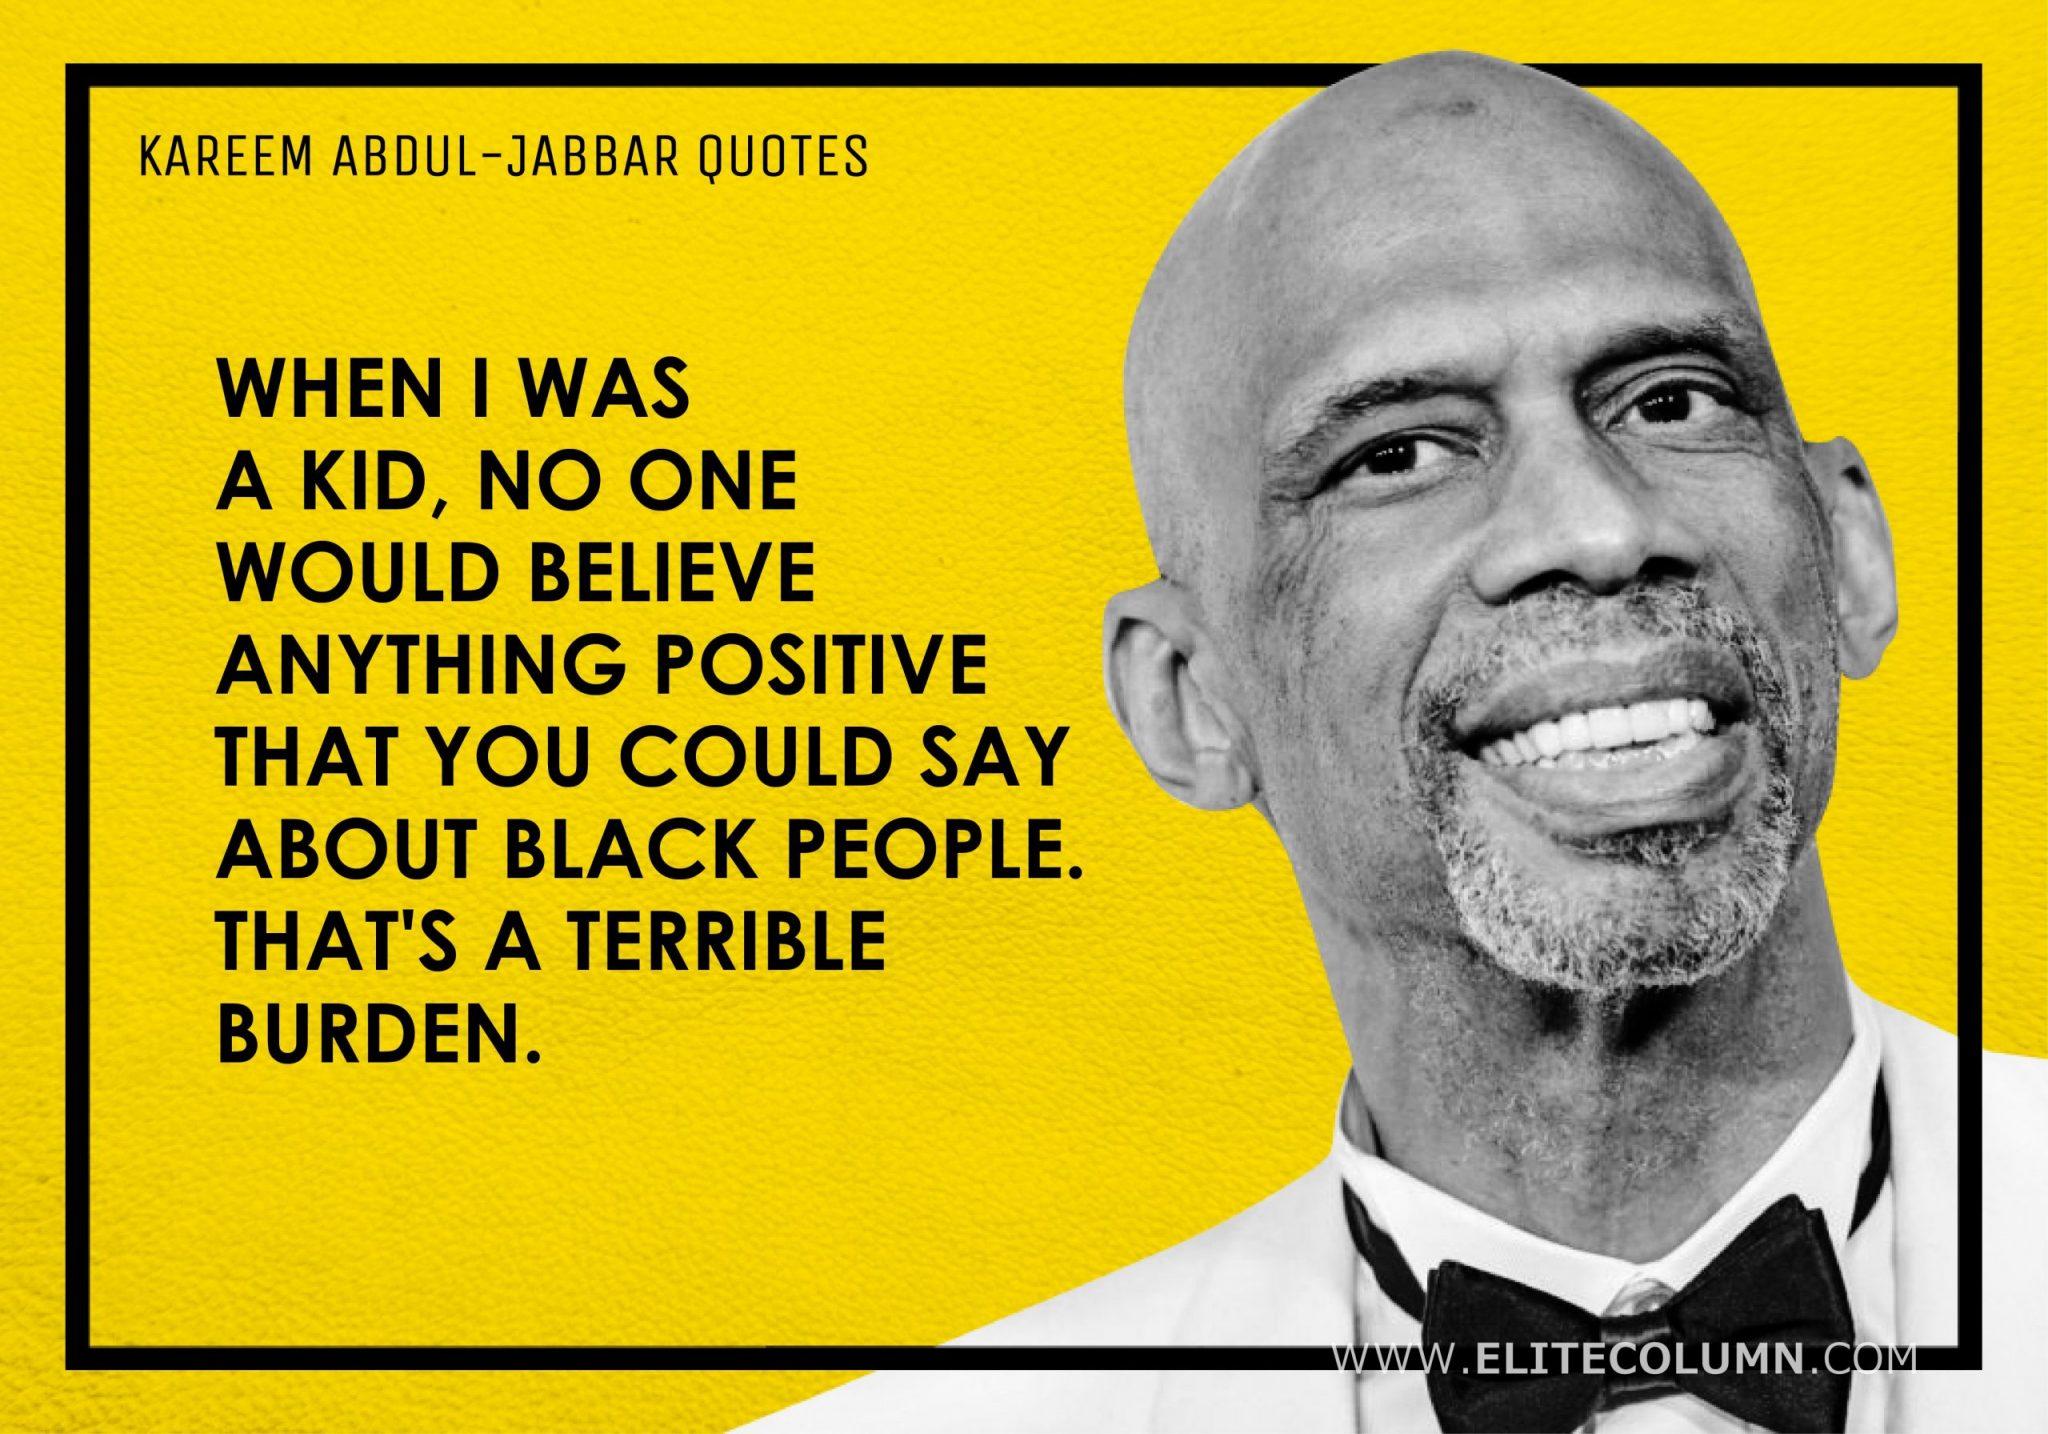 Kareem Abdul-Jabbar Quotes (3)